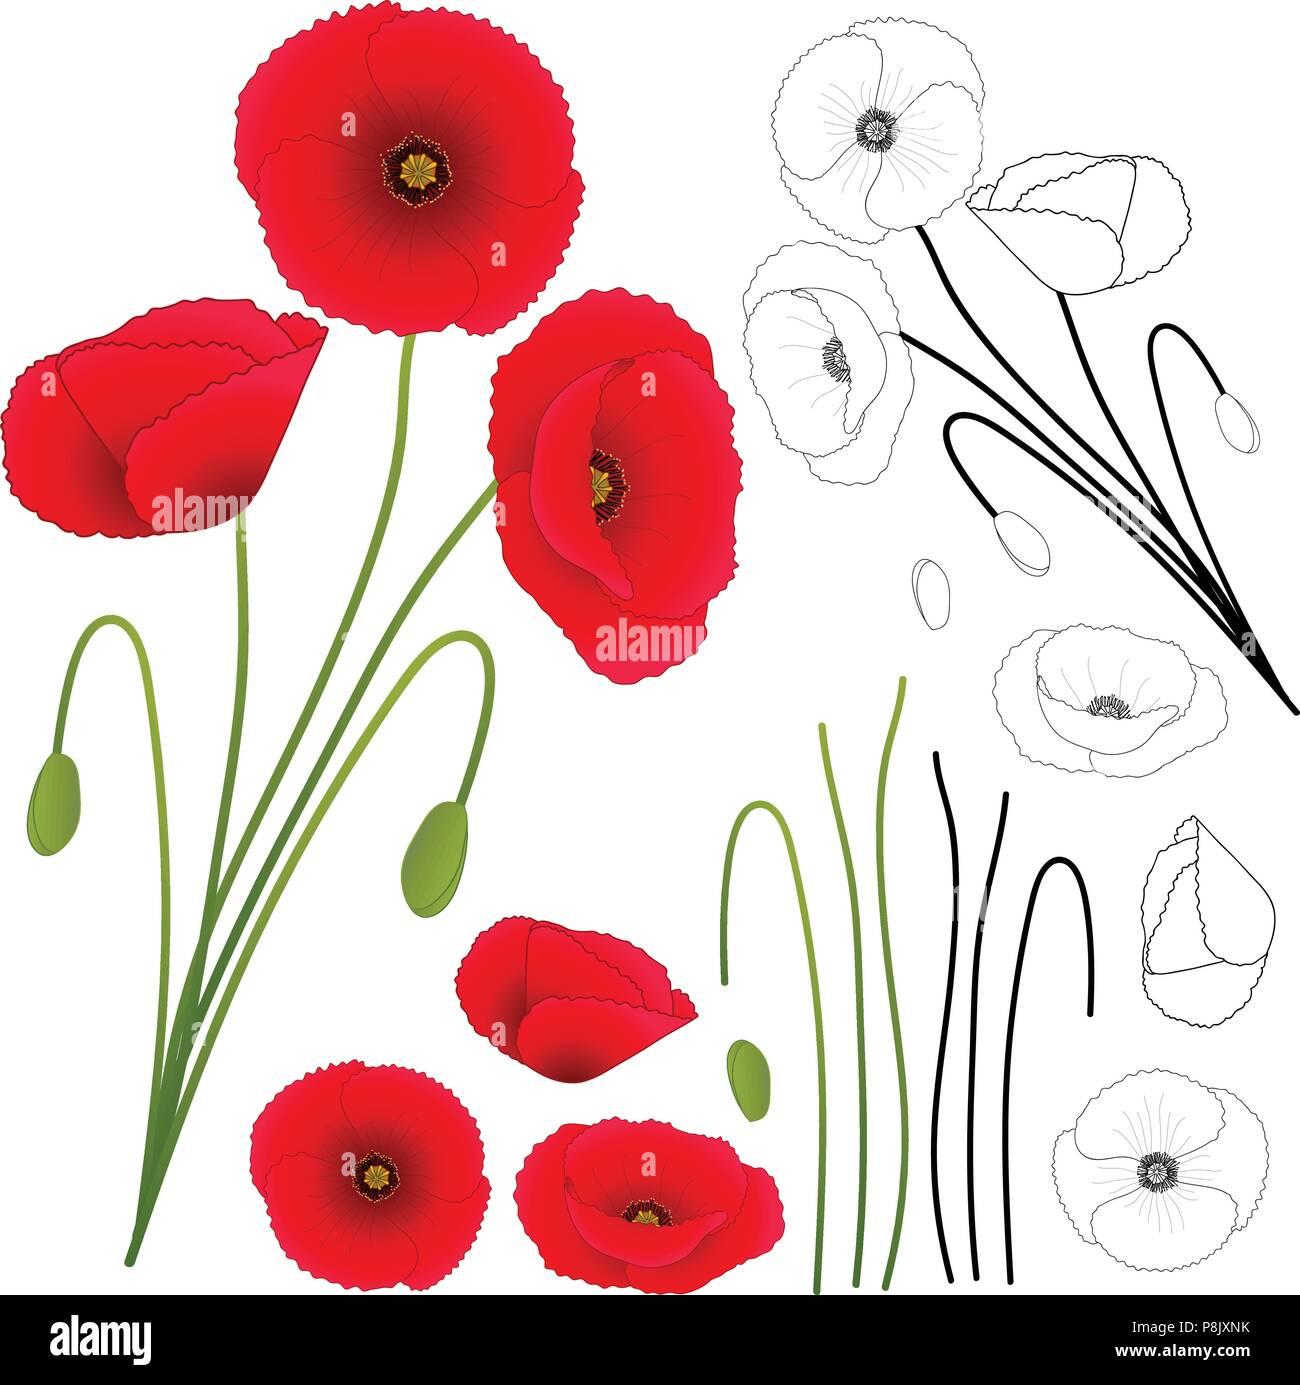 Papaver rhoeas (or common poppy,corn poppy,corn rose,field poppy,Flanders poppy or red poppy) isolated on White Background. Vector Illustration. - Stock Vector